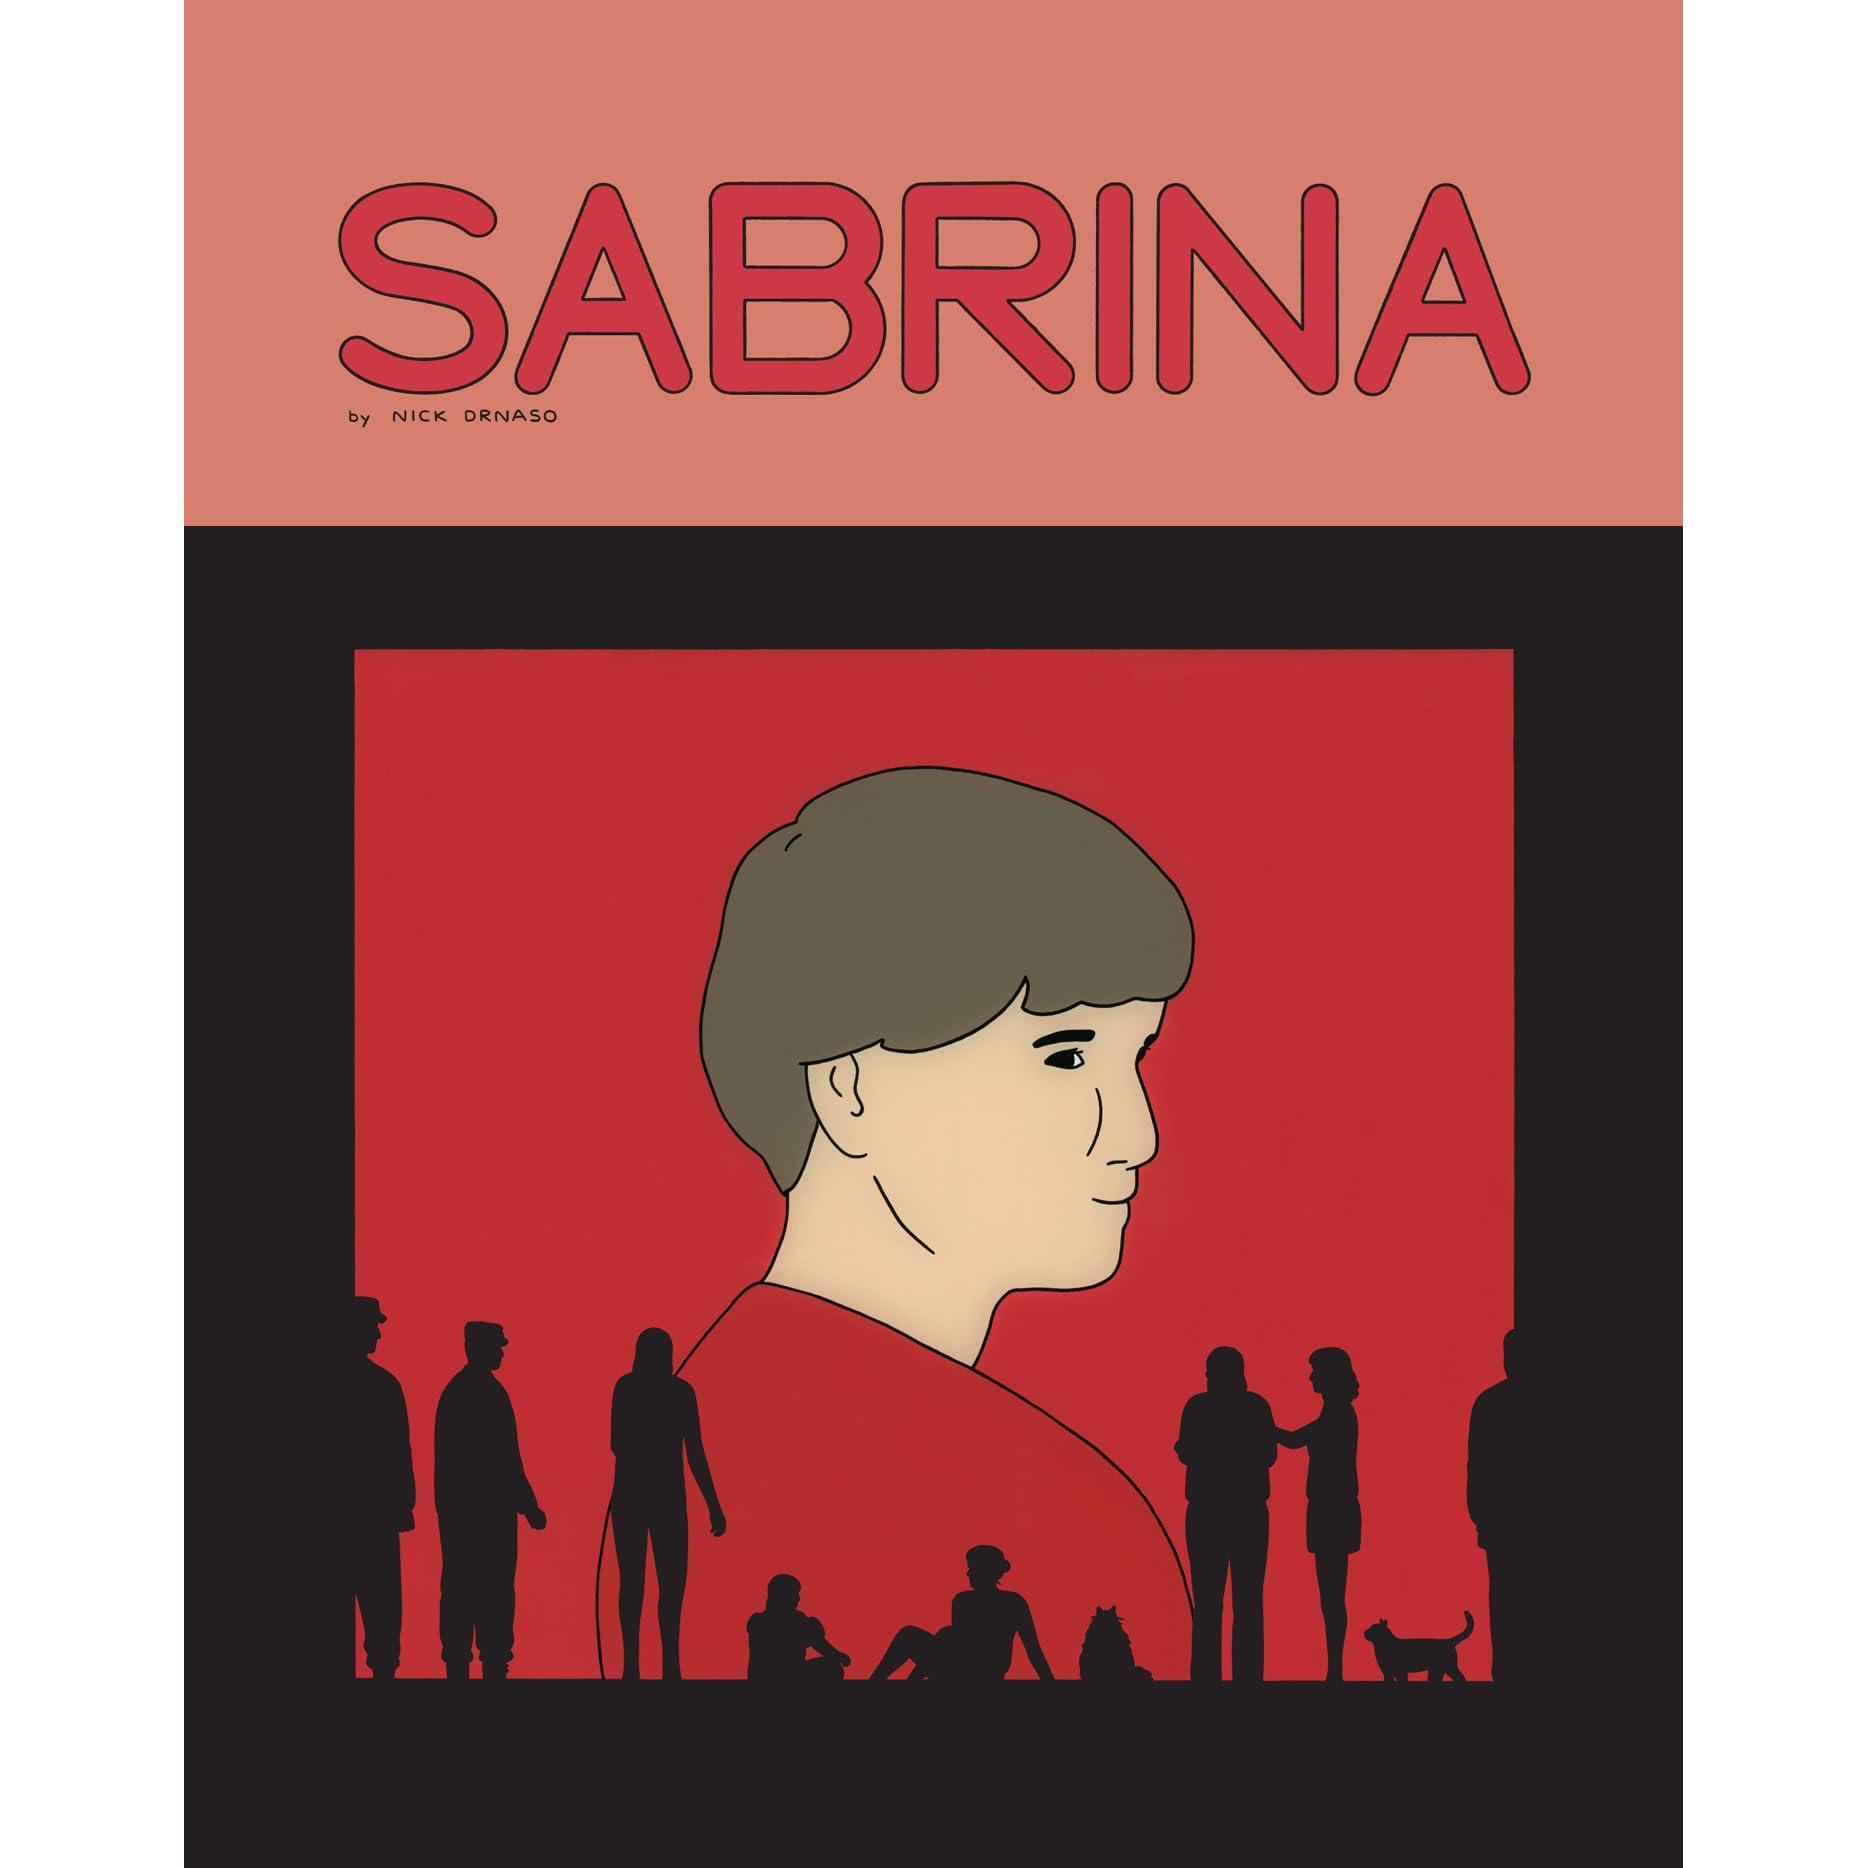 Image result for sabrina drnaso